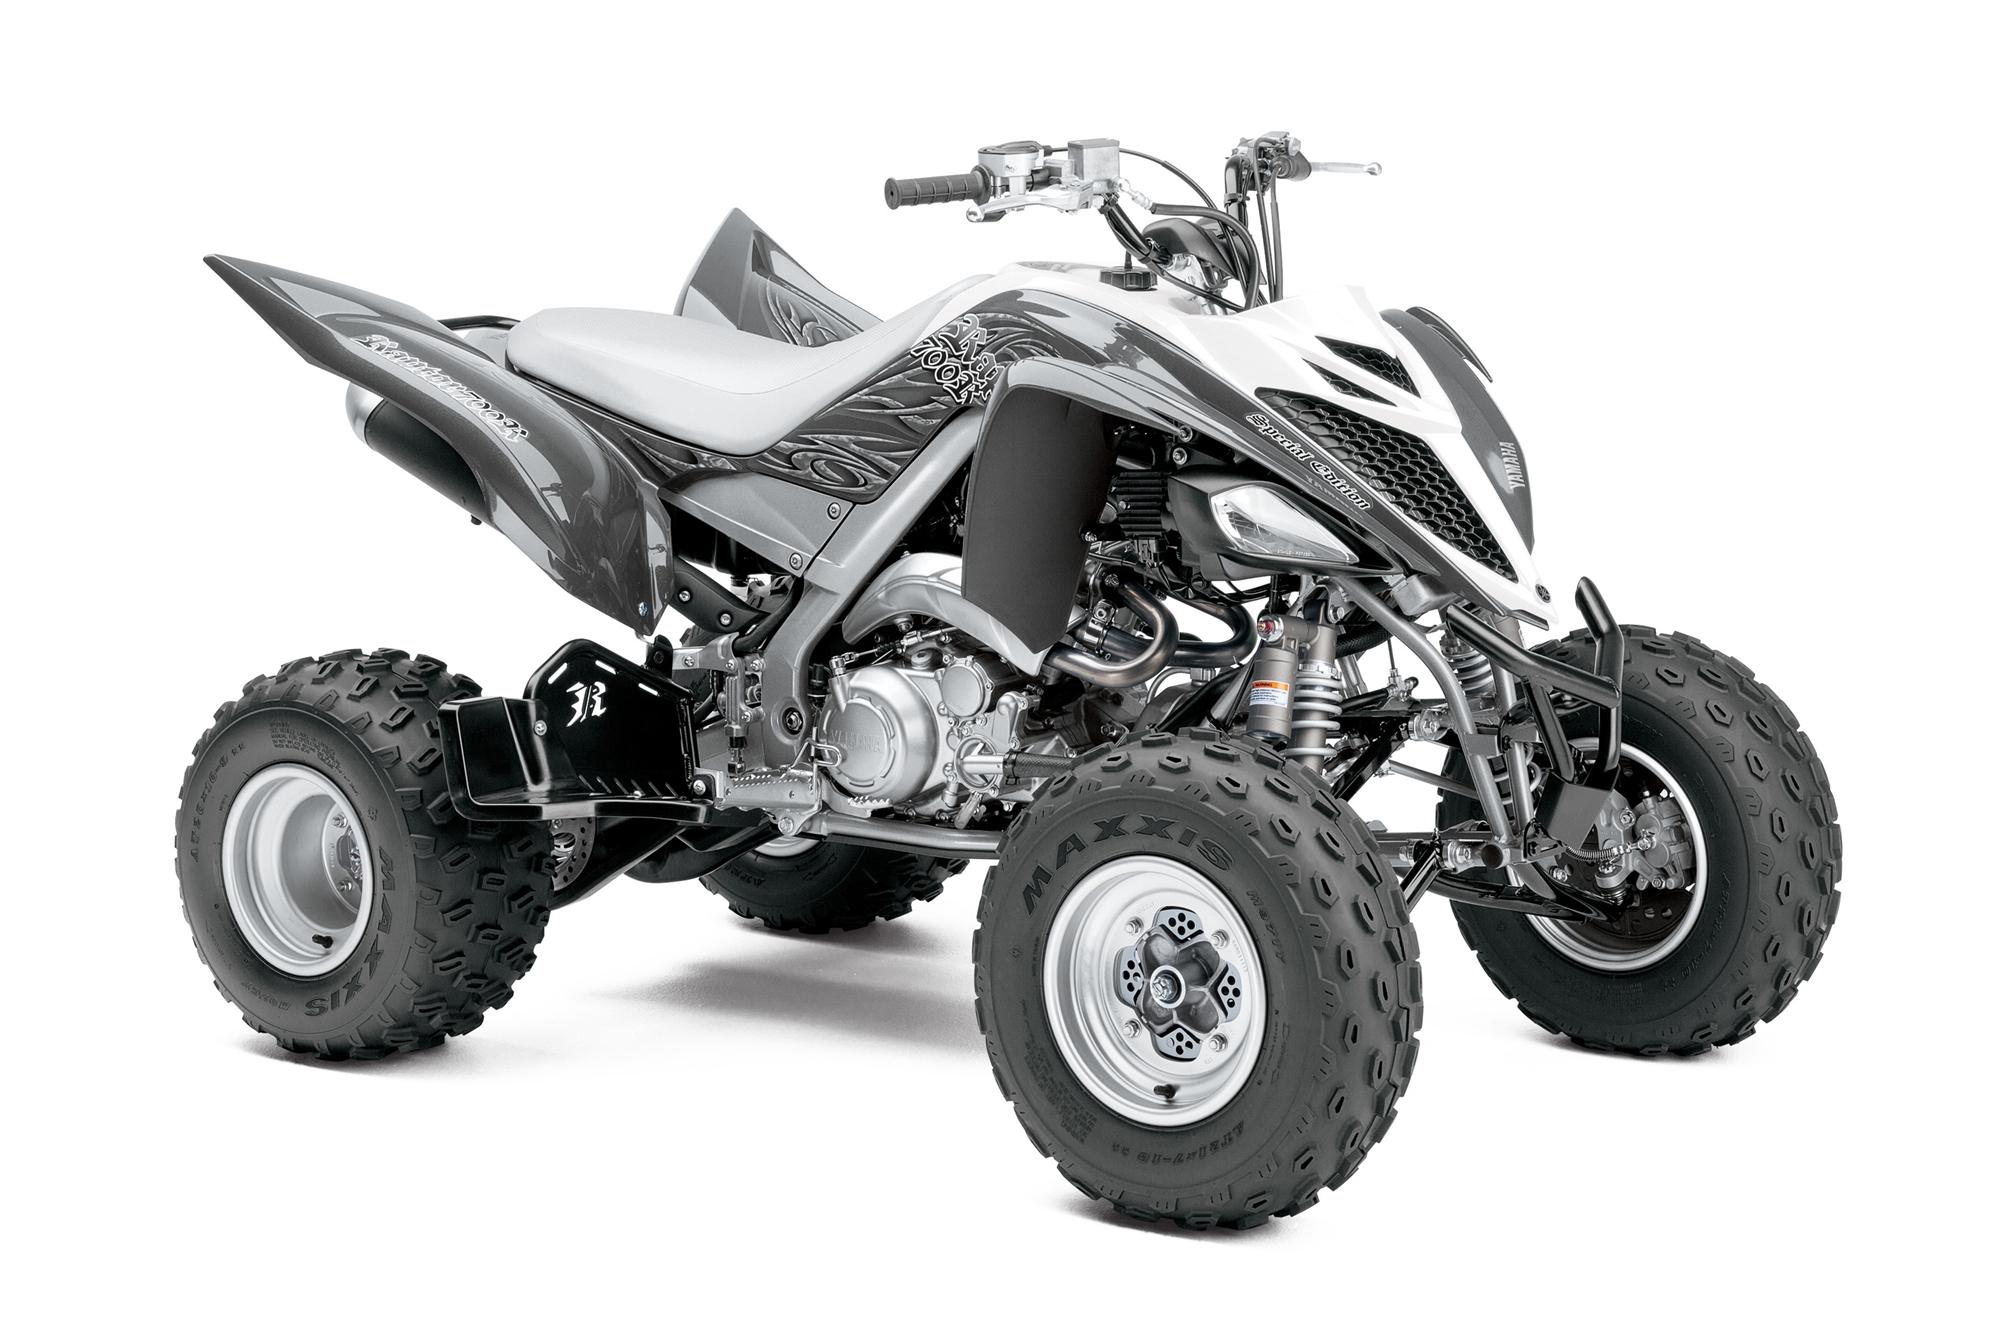 2014 yamaha raptor 700r se presently available